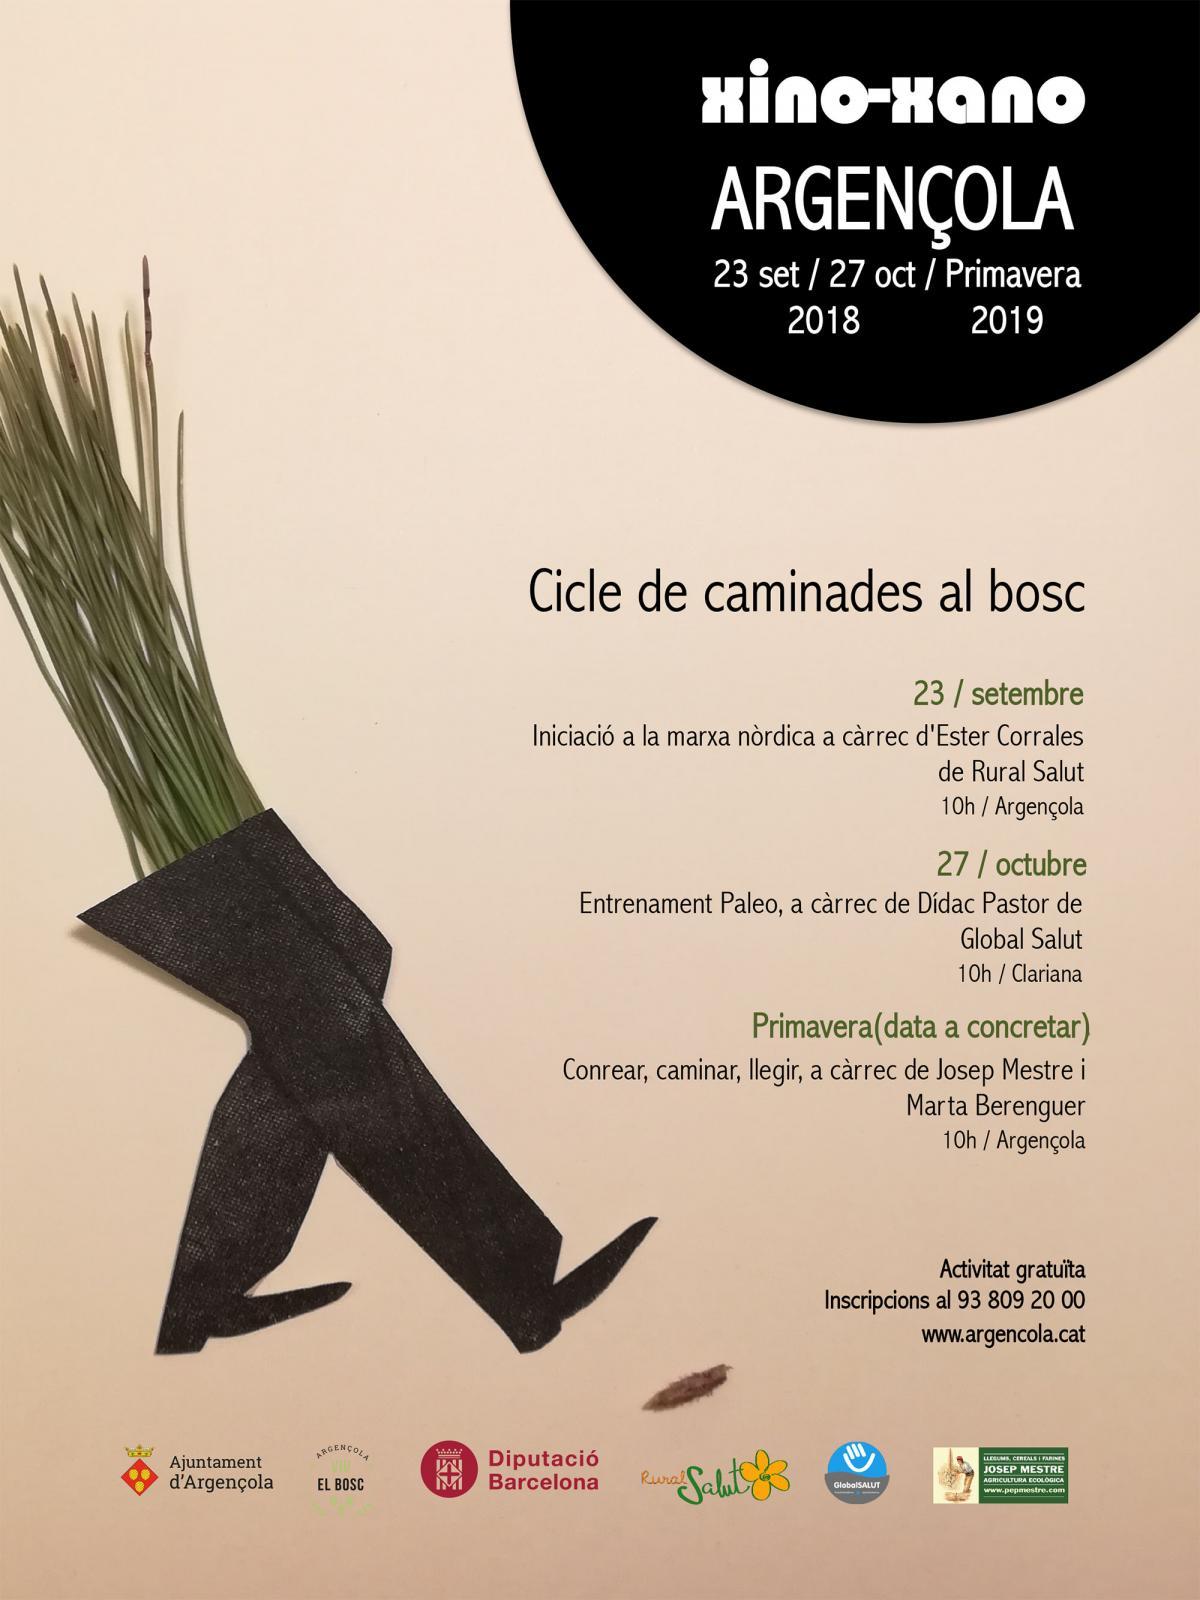 'Xino-Xano' cicle de caminades al bosc d'Argençola